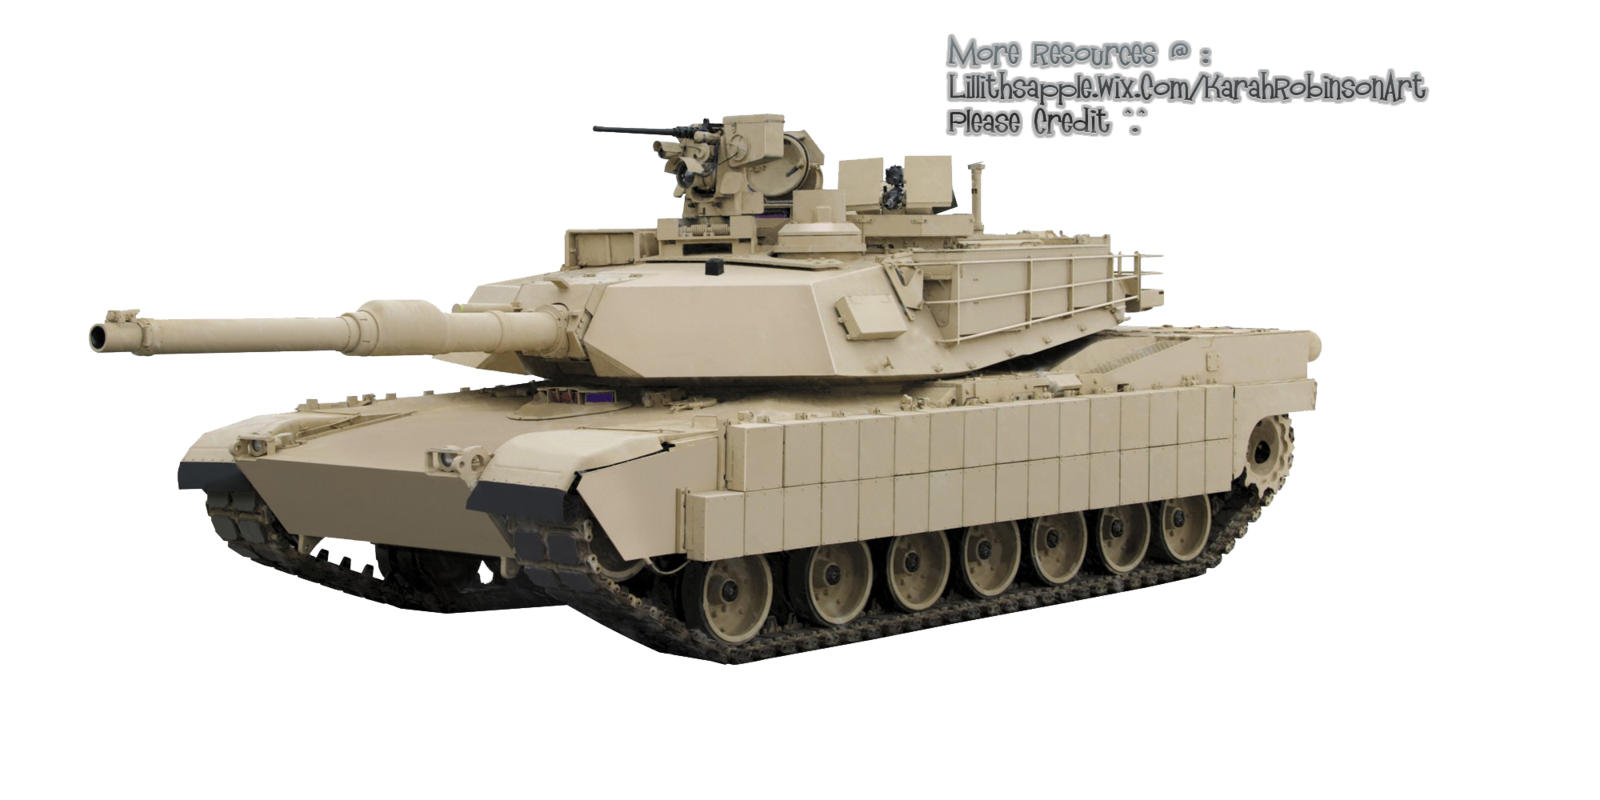 Military Tank Png - Military Tank Png Hdpng.com , Transparent background PNG HD thumbnail